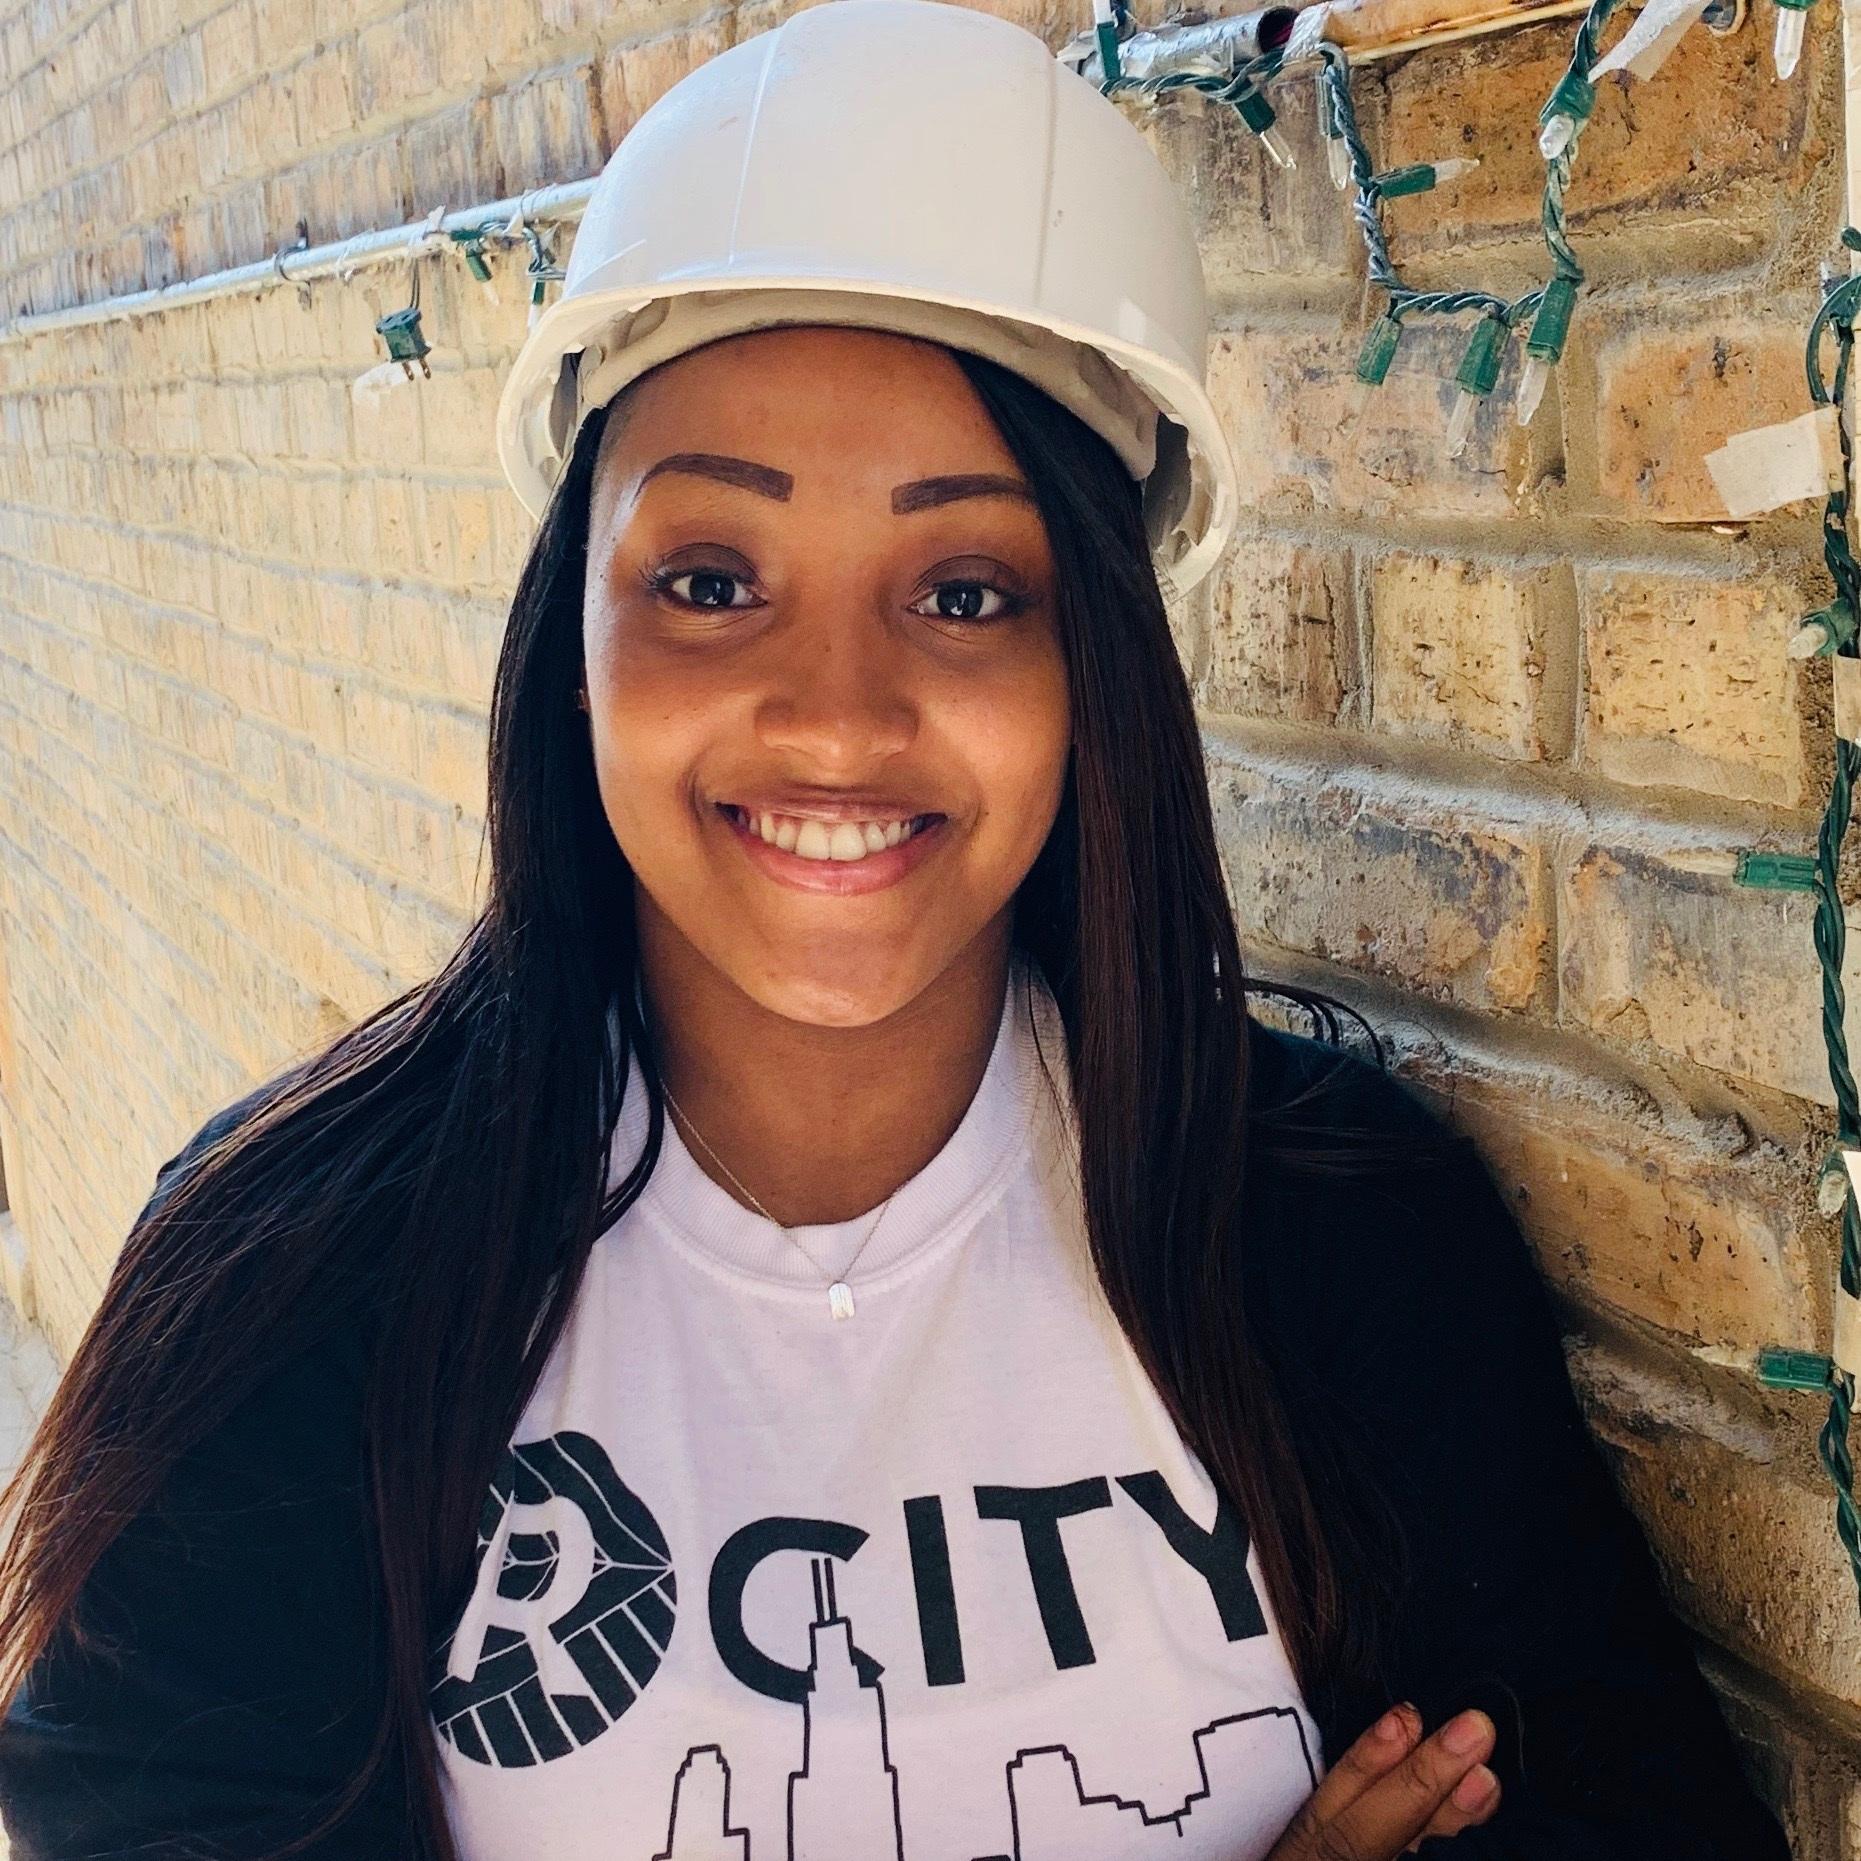 Charnesha Collier - Tuckpointing Crew Leader, Harambee Citybuilders